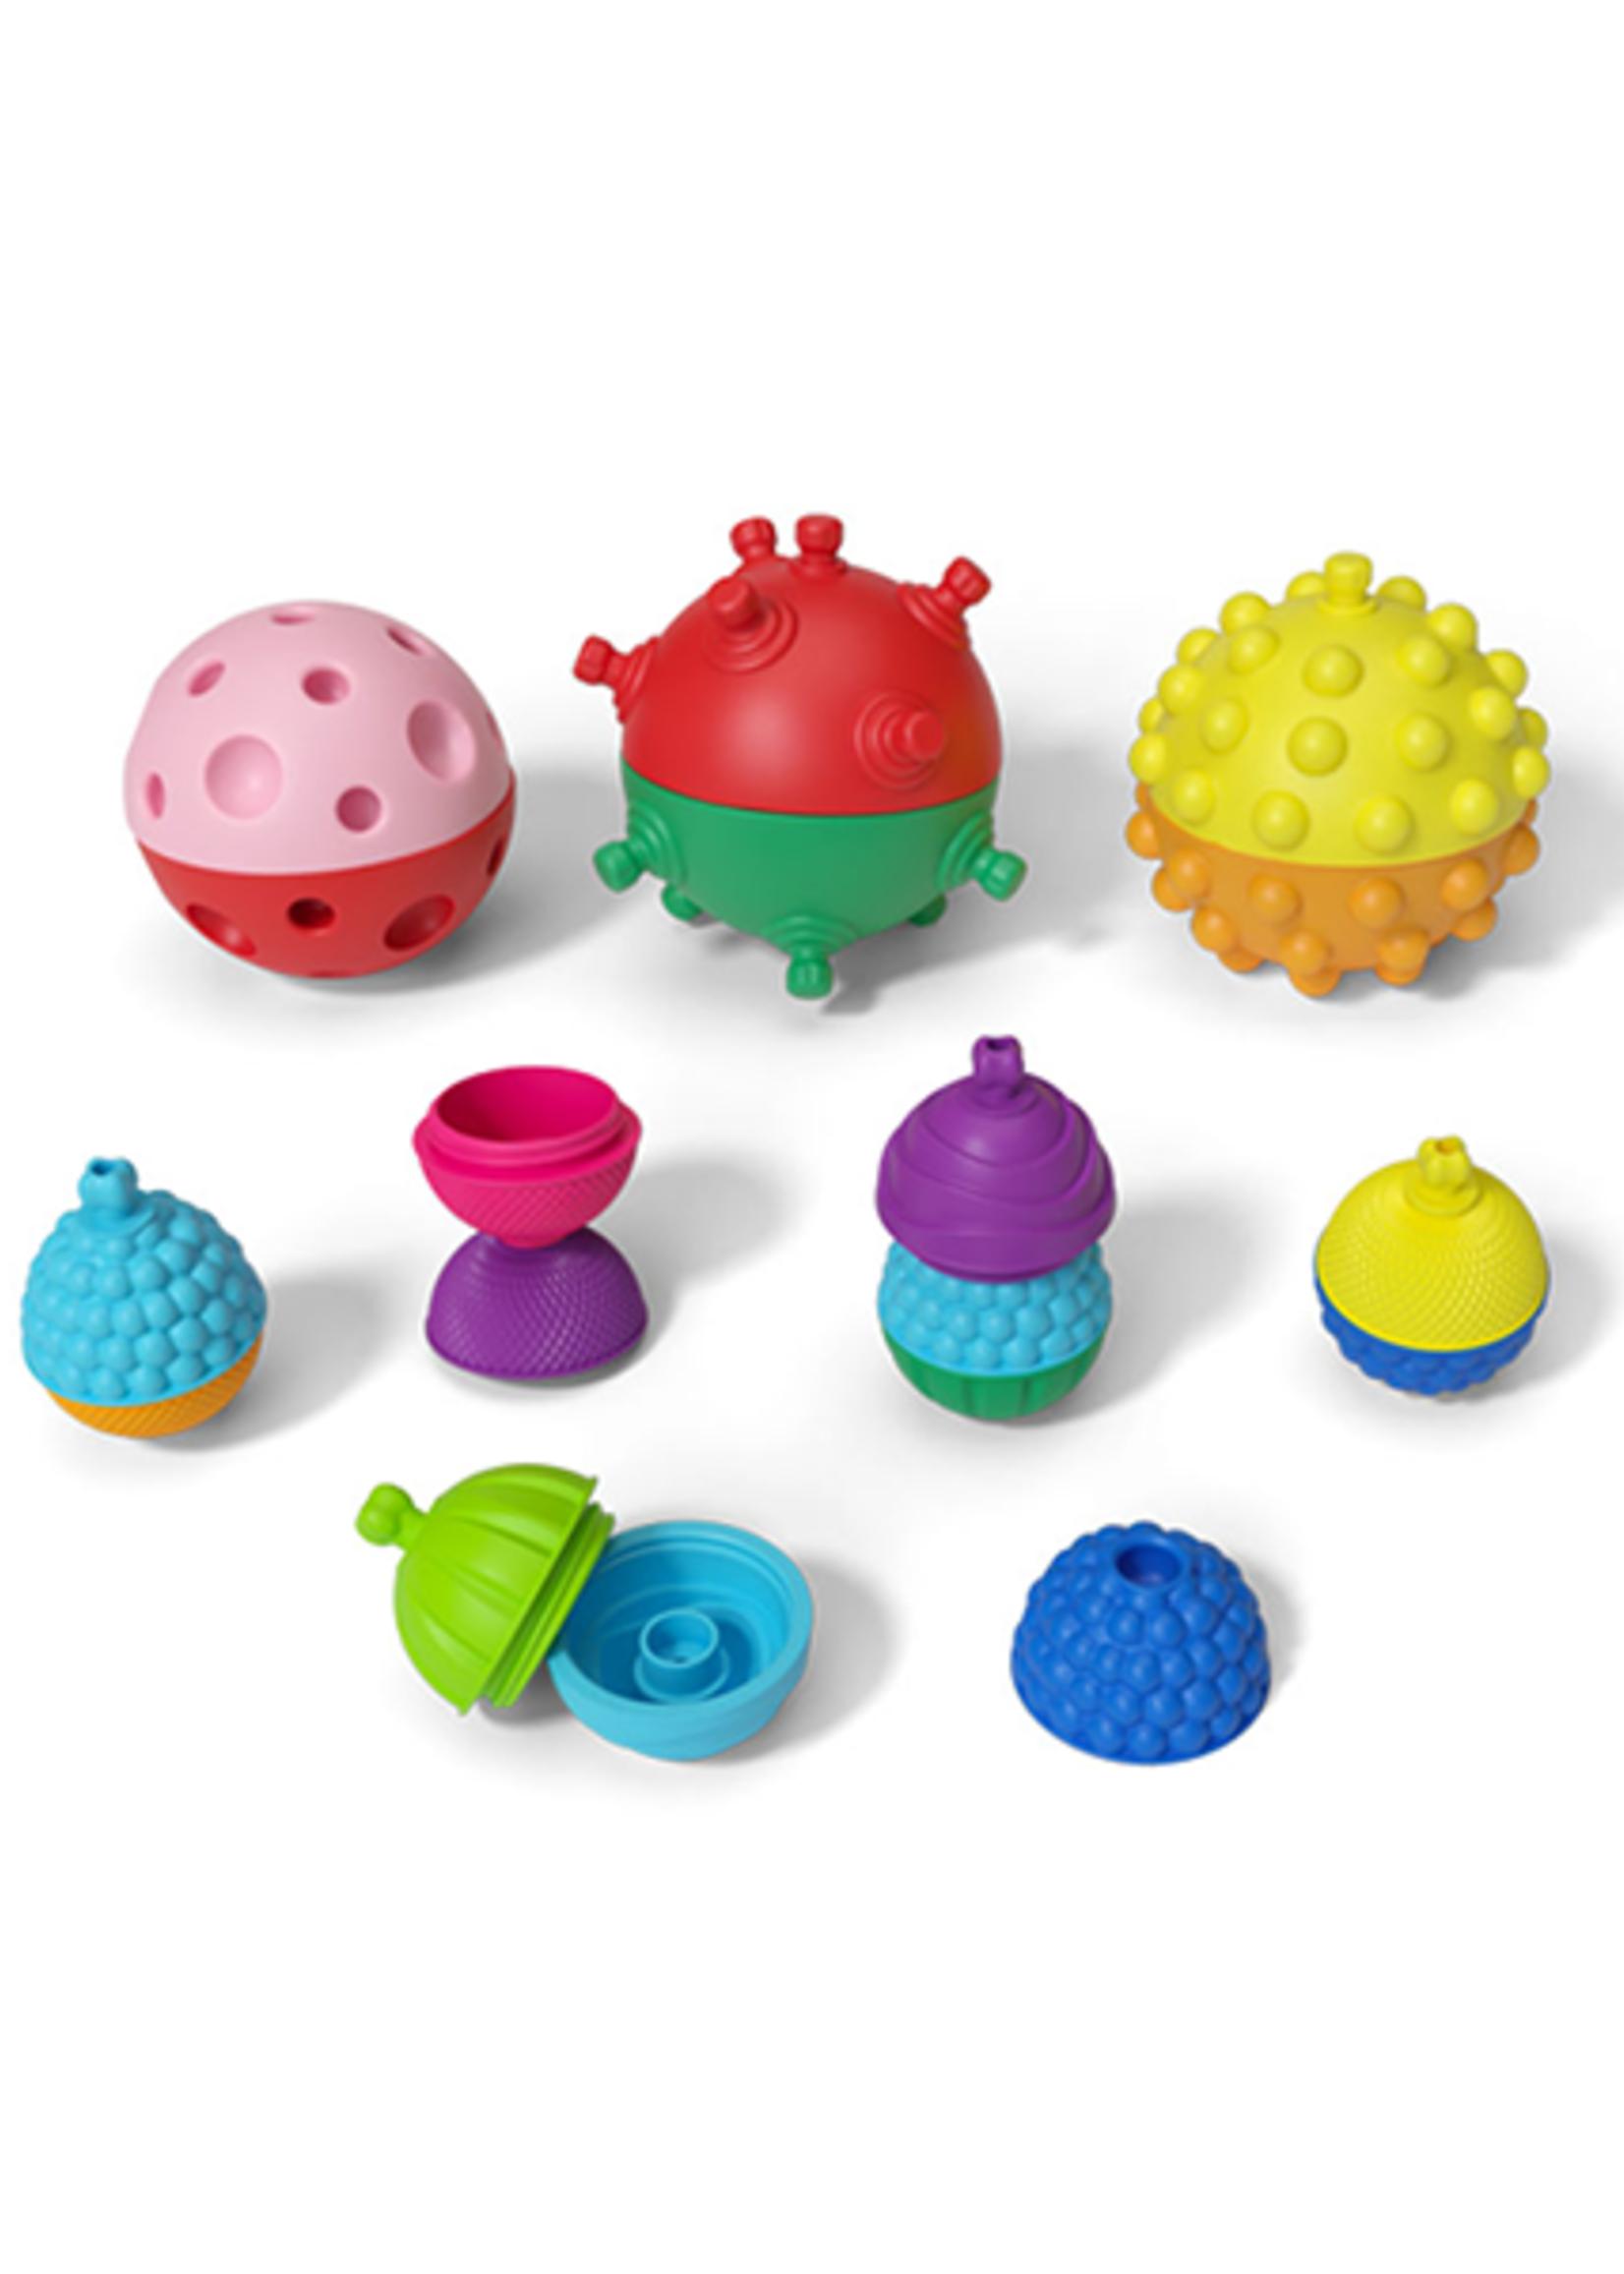 3 Sensory Balls With 12 Pce Beads